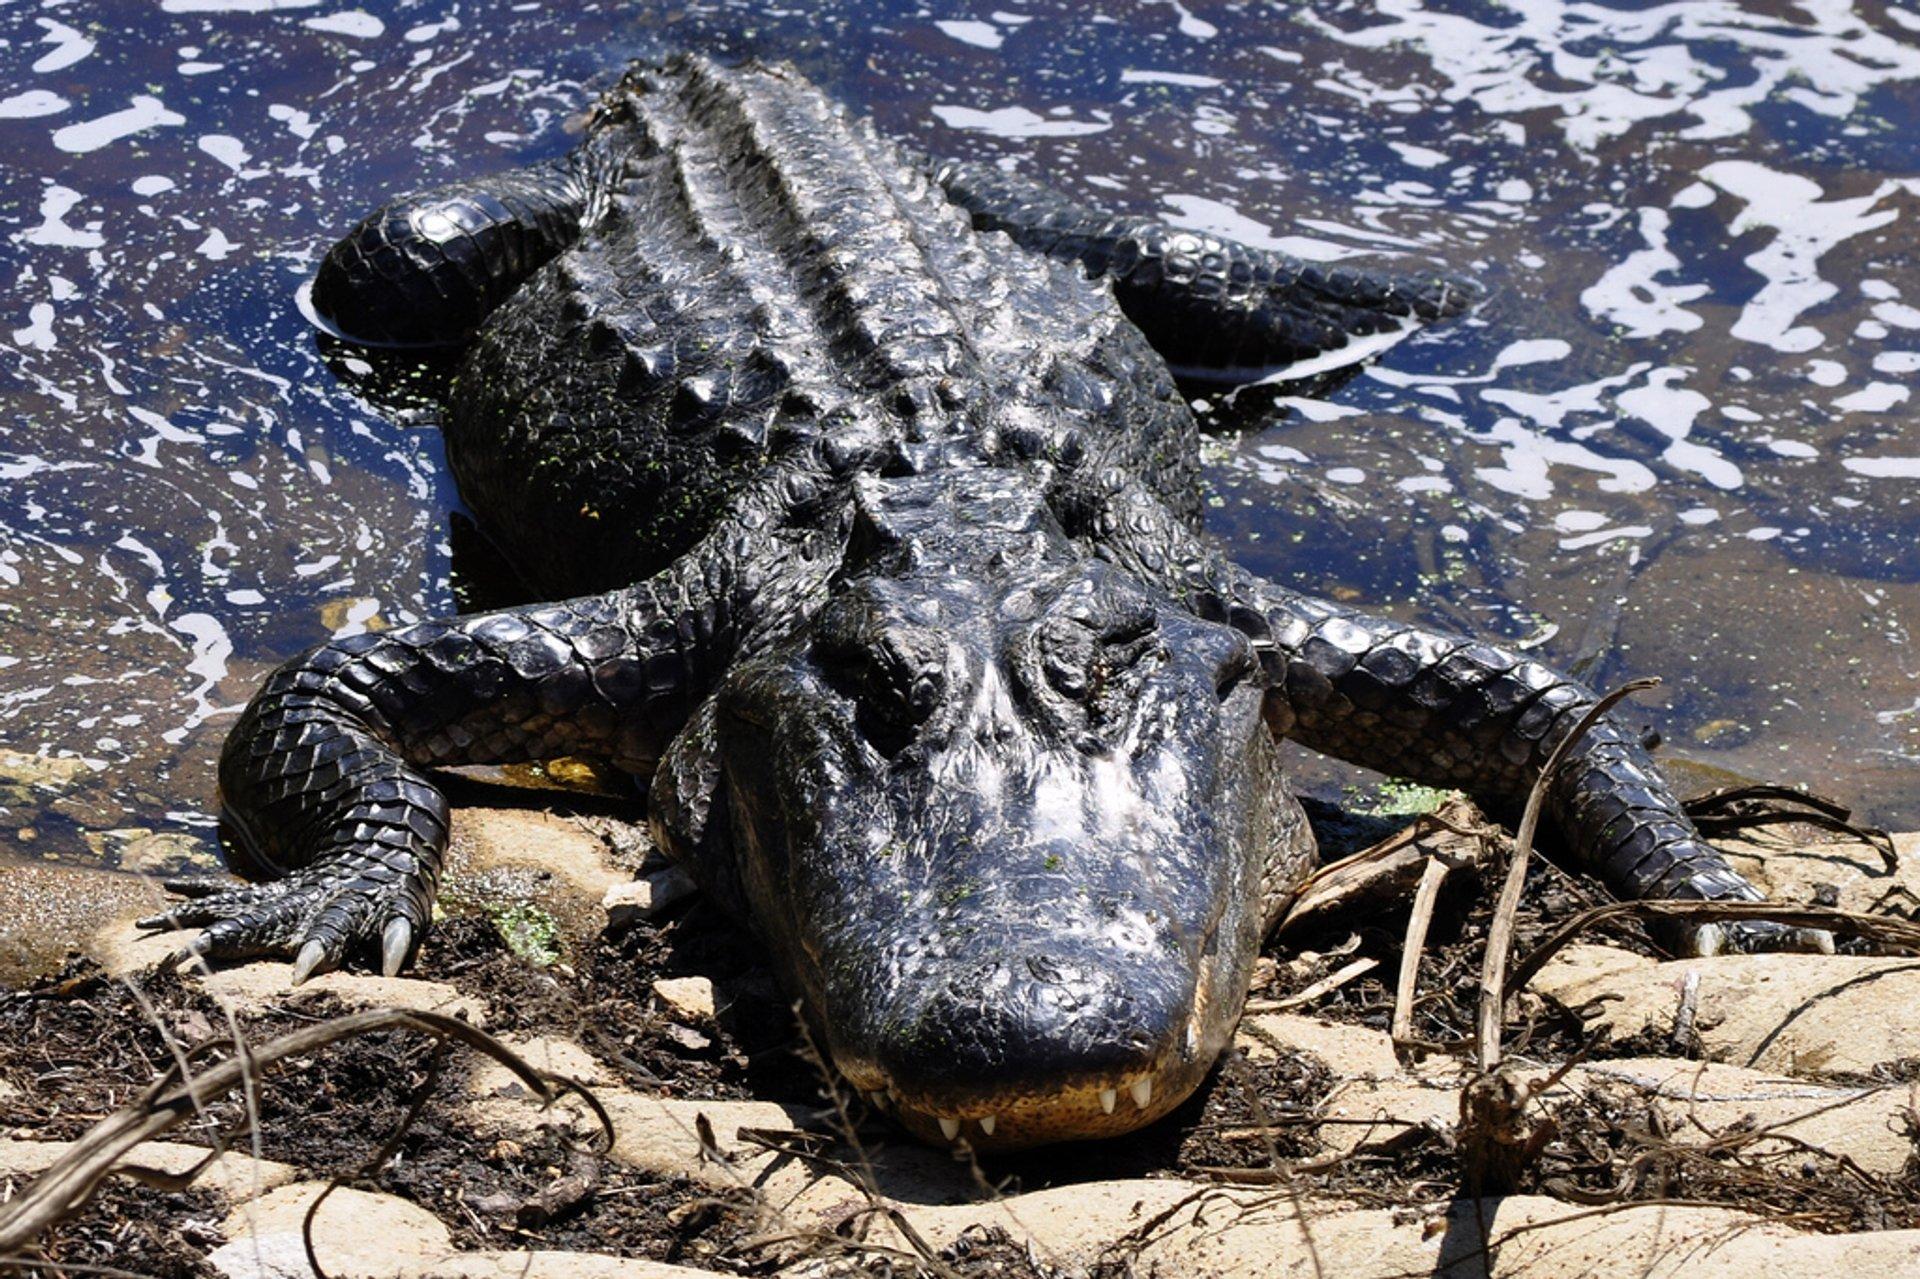 Alligator at Brazos Bend State Park 2020